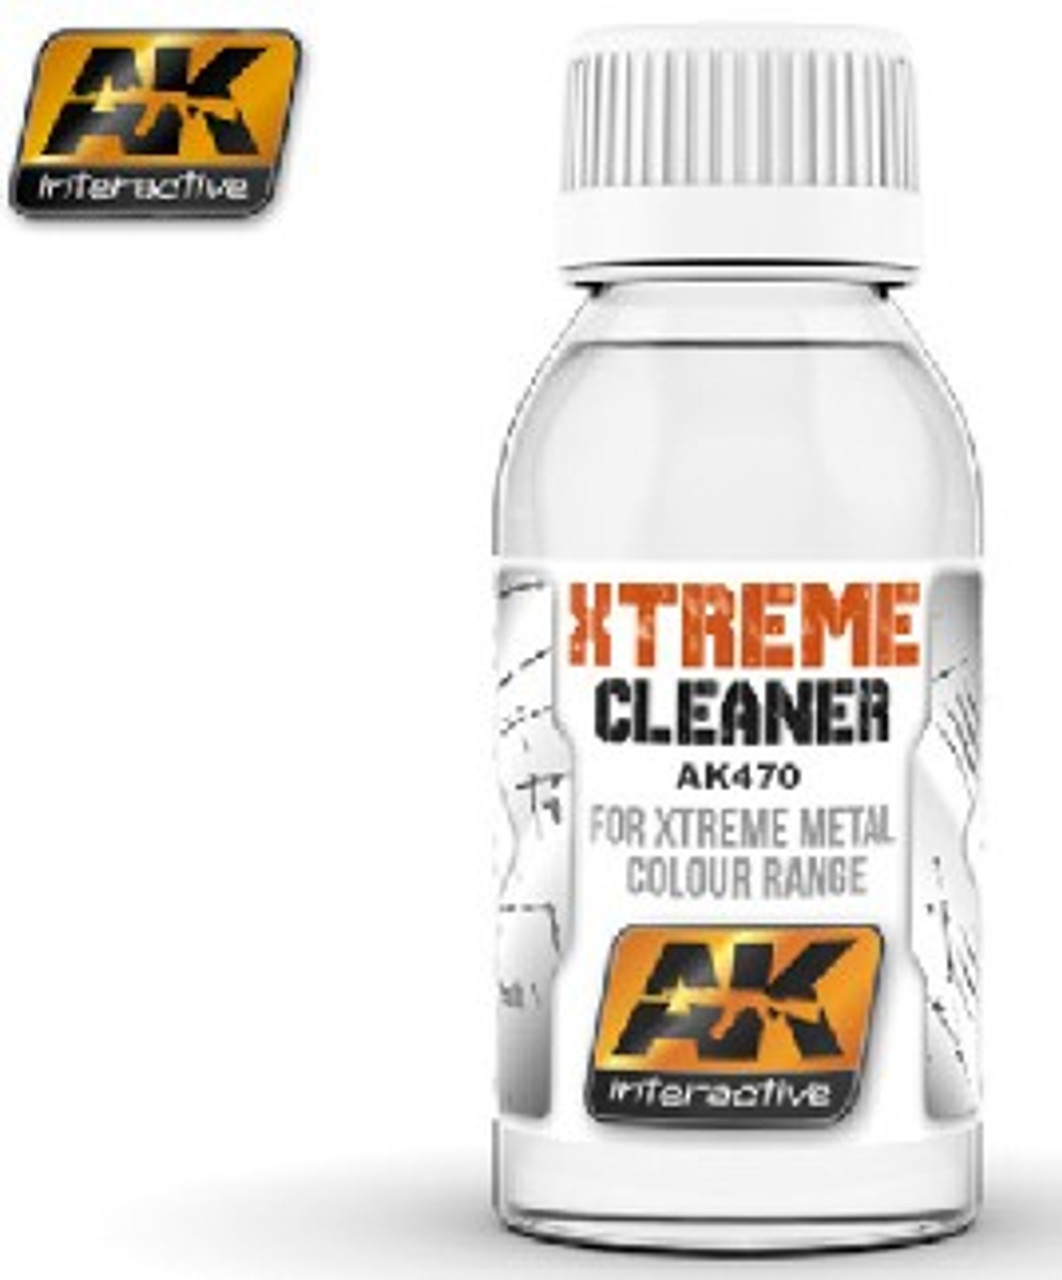 Xtreme Cleaner for Xtreme Metal Color Range 100ml Bottle